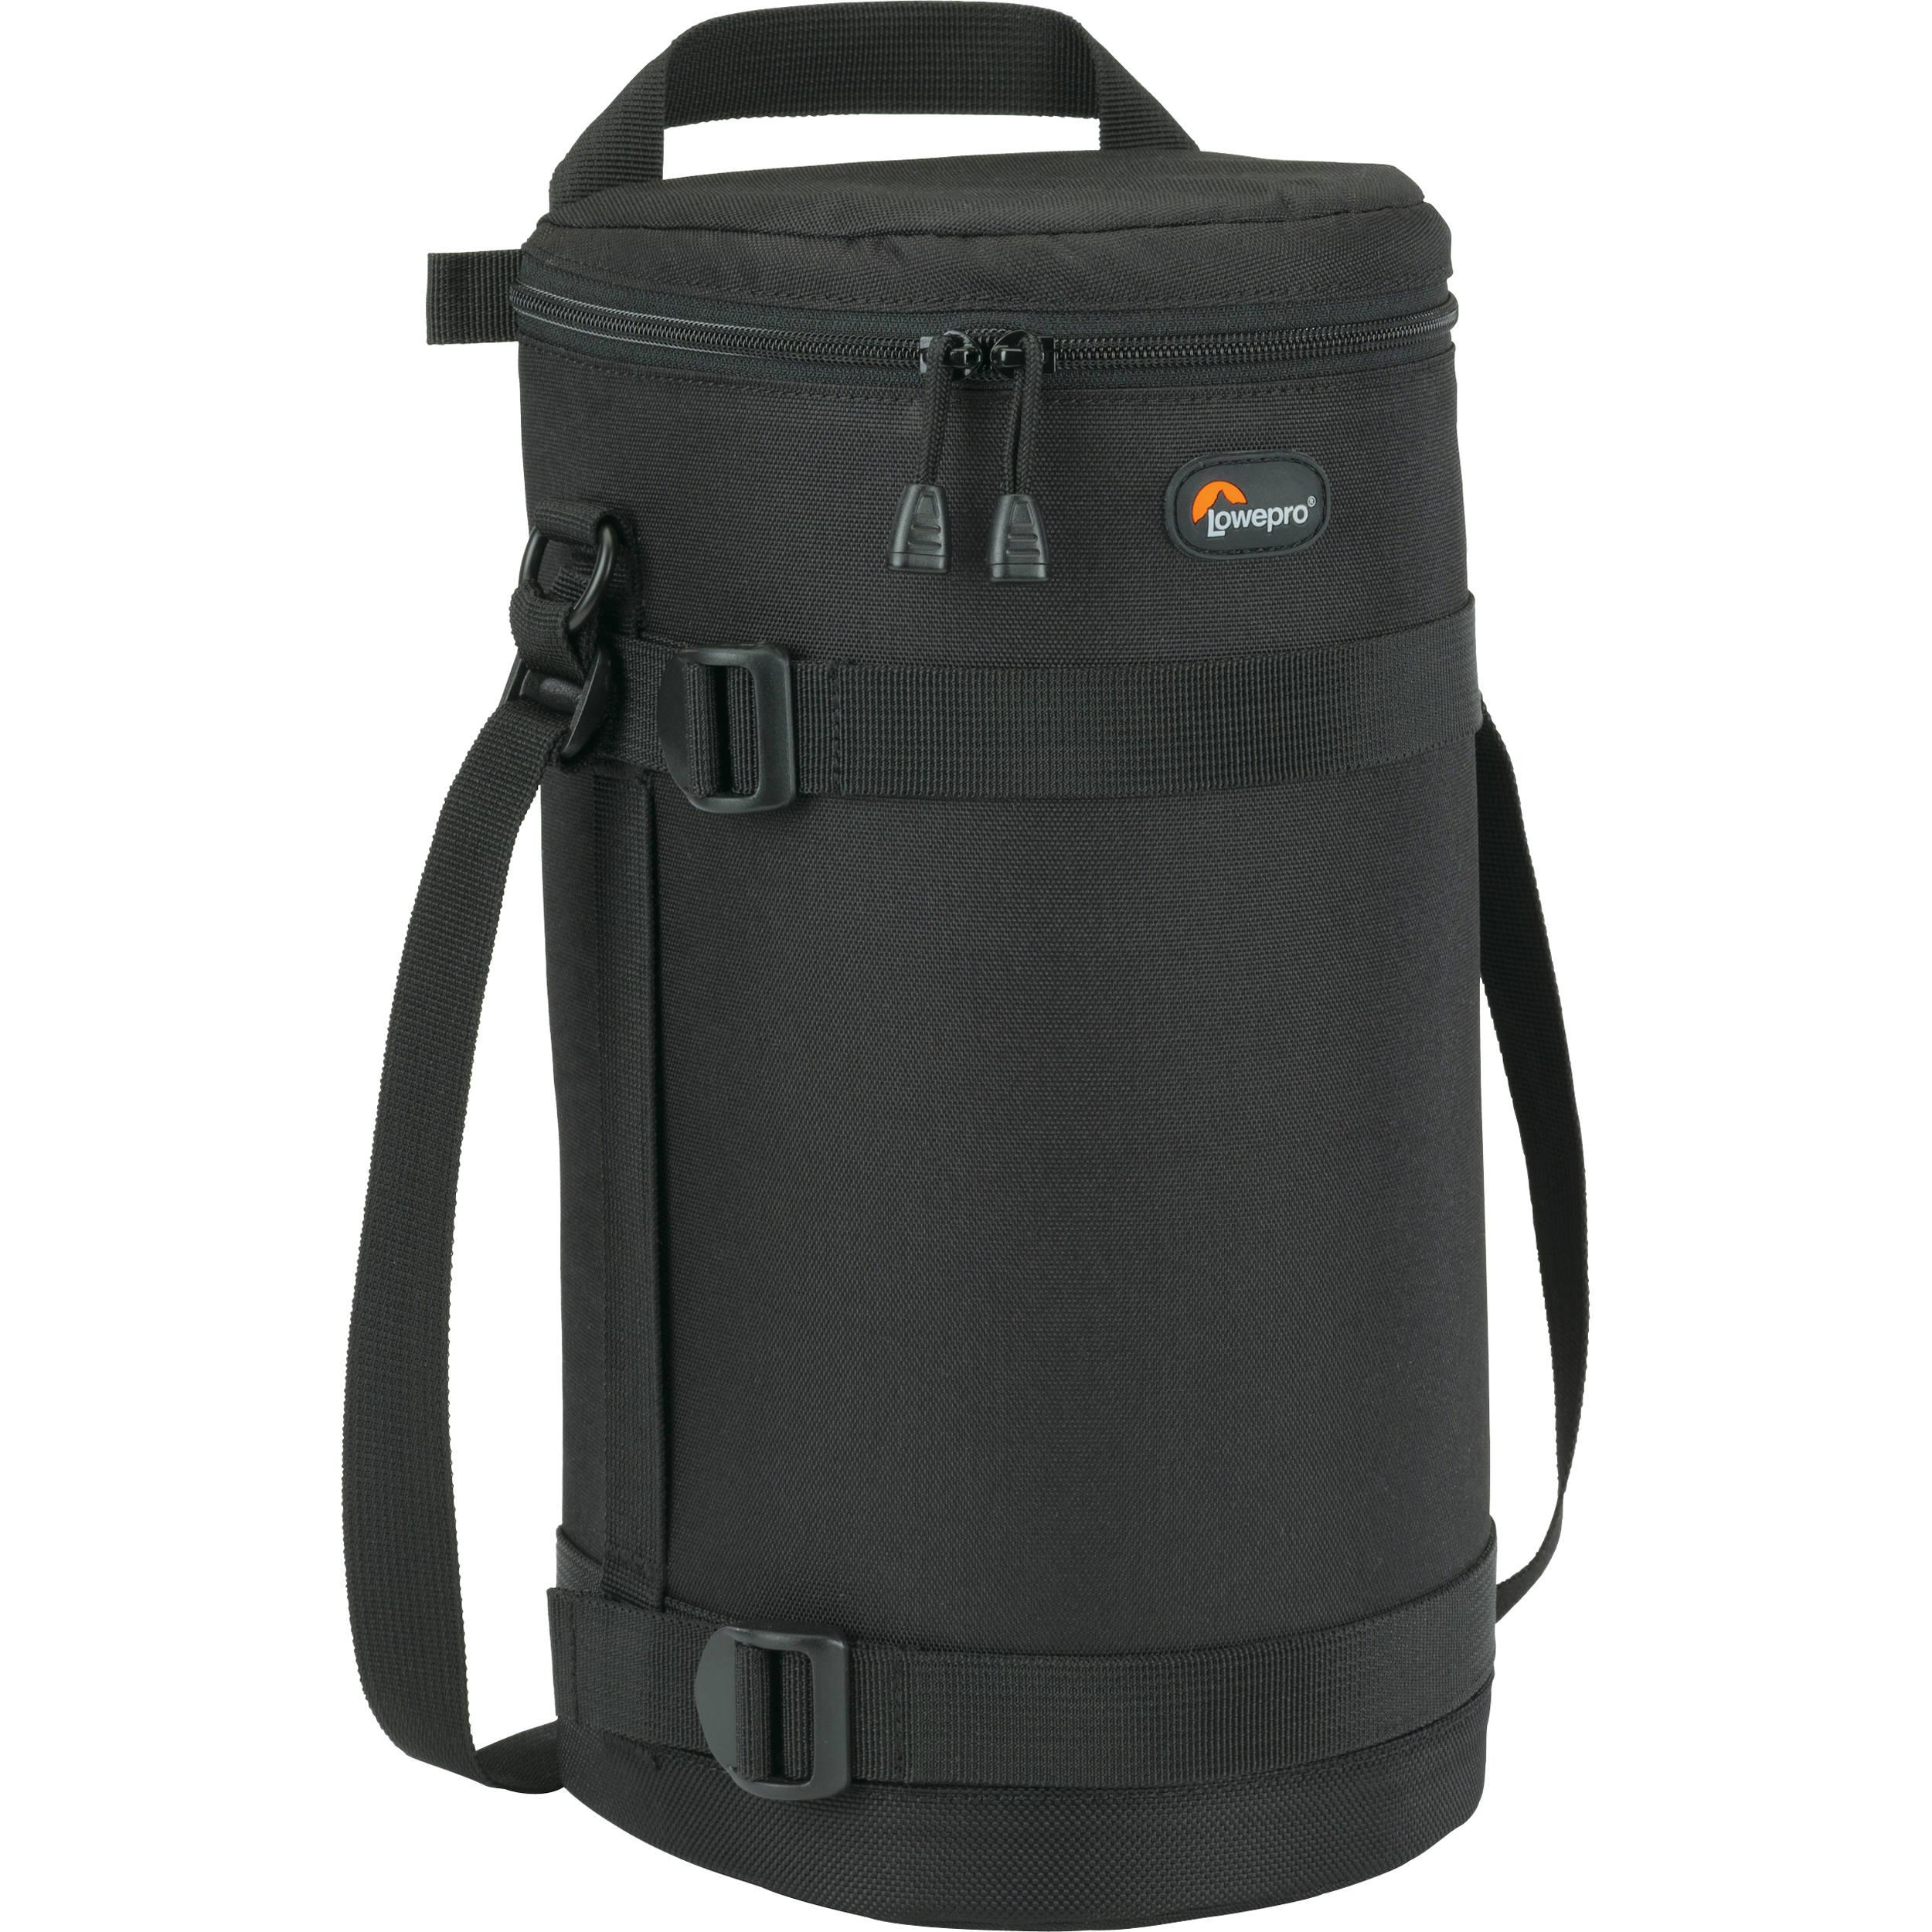 Lowepro Lens Cases Bh Photo Video Orion Aw Case 13 X 32cm Black